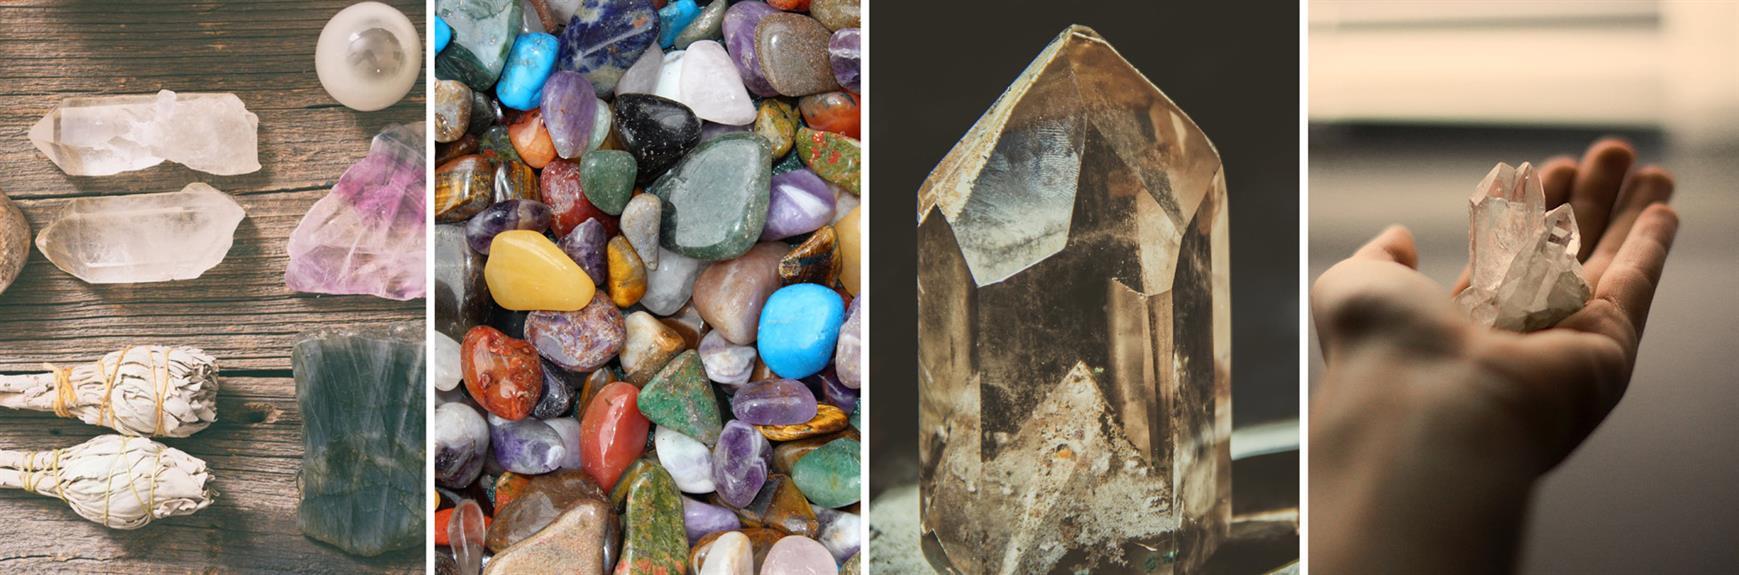 Redland City Event - Become a Crystal Healer (Level 1 & 2 intensive)